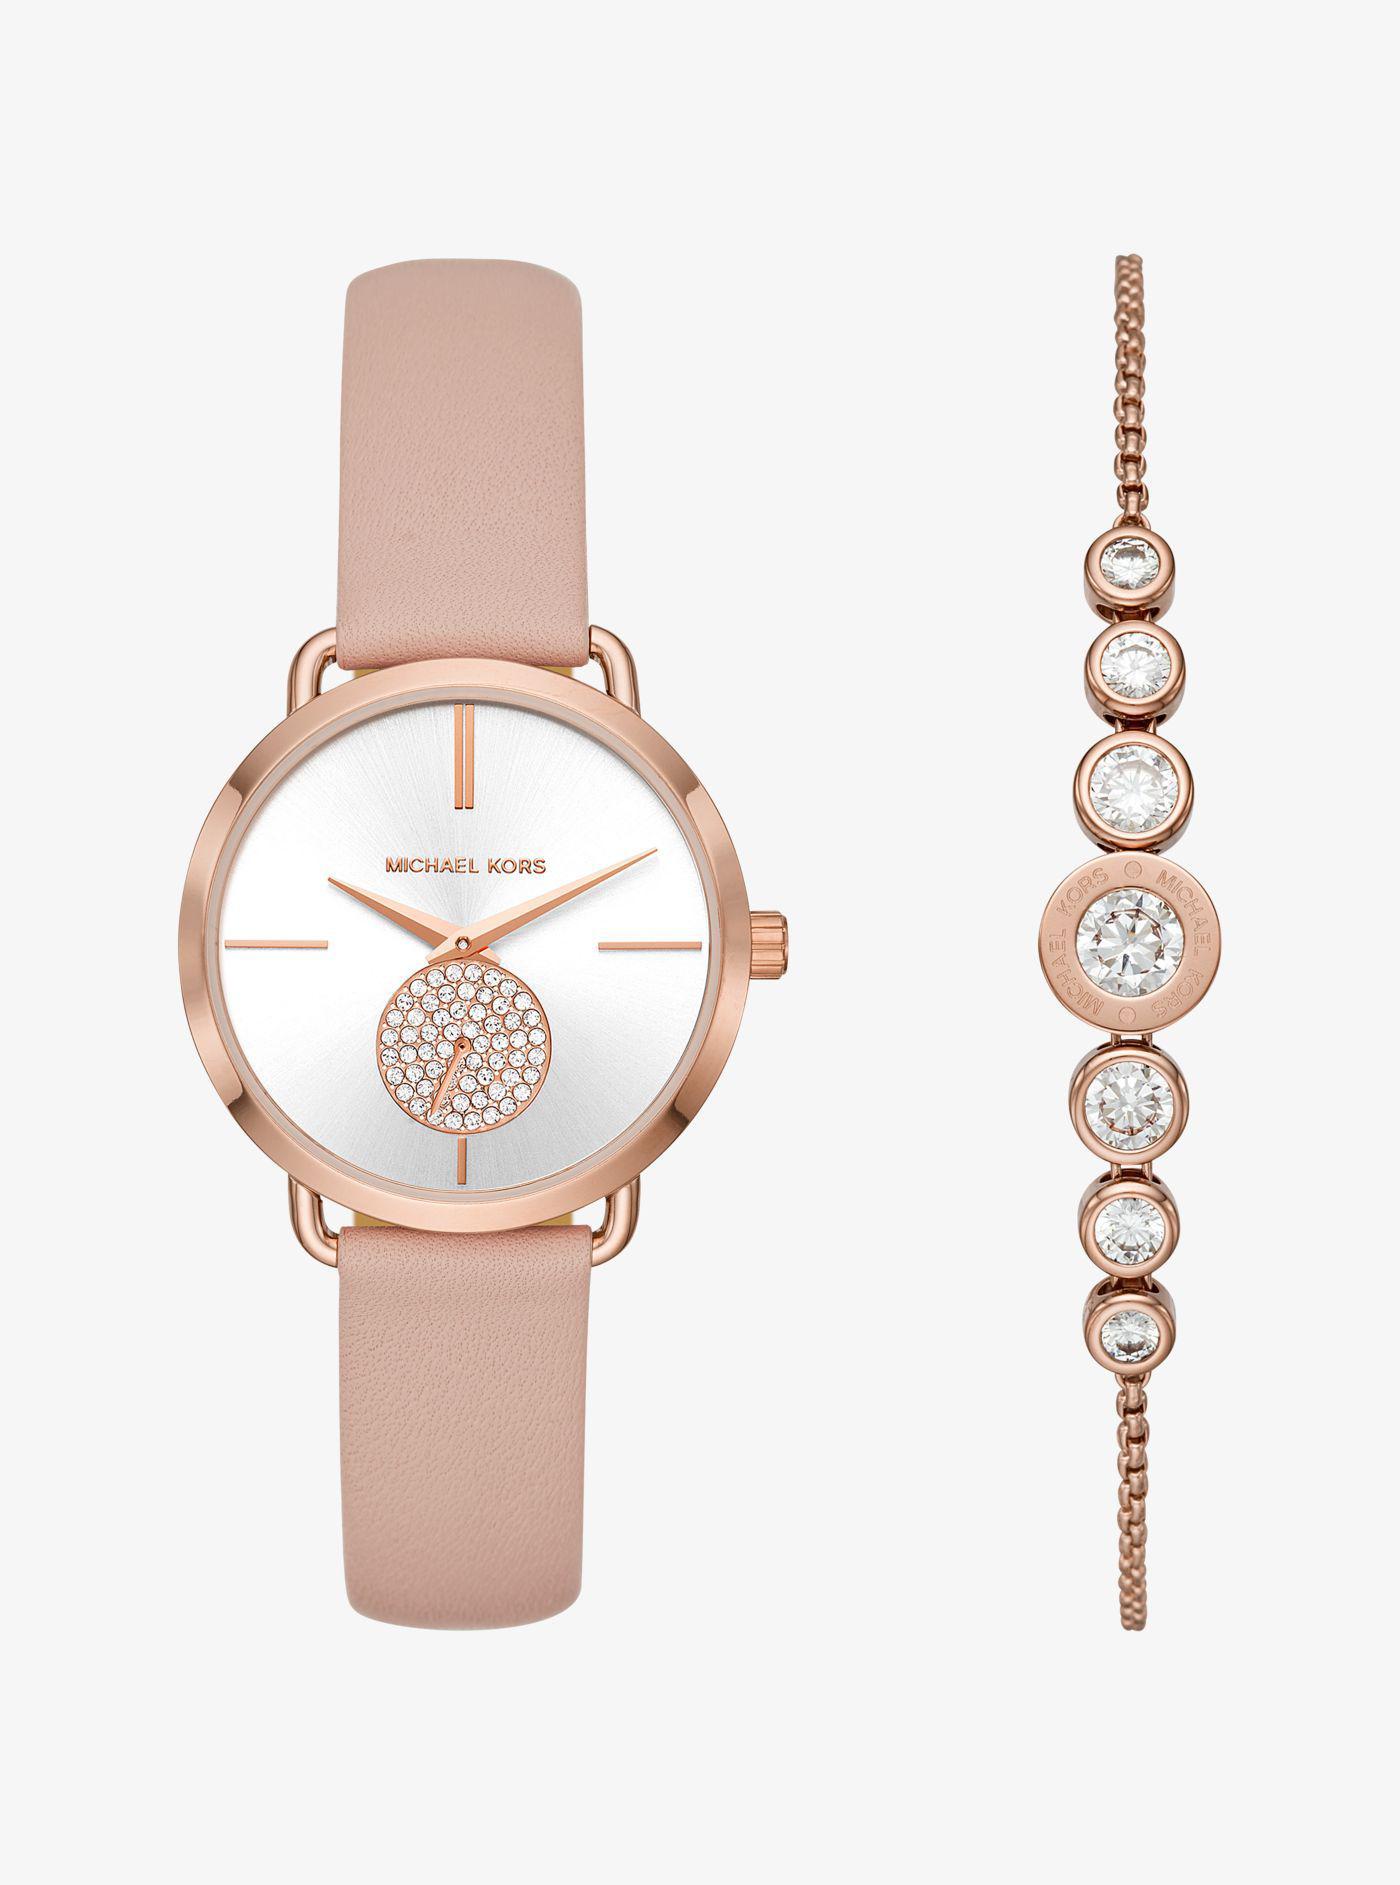 d835b73caddc Michael Kors Ladies Rose Gold Tone Bracelet Watch - Image Of Bear ...